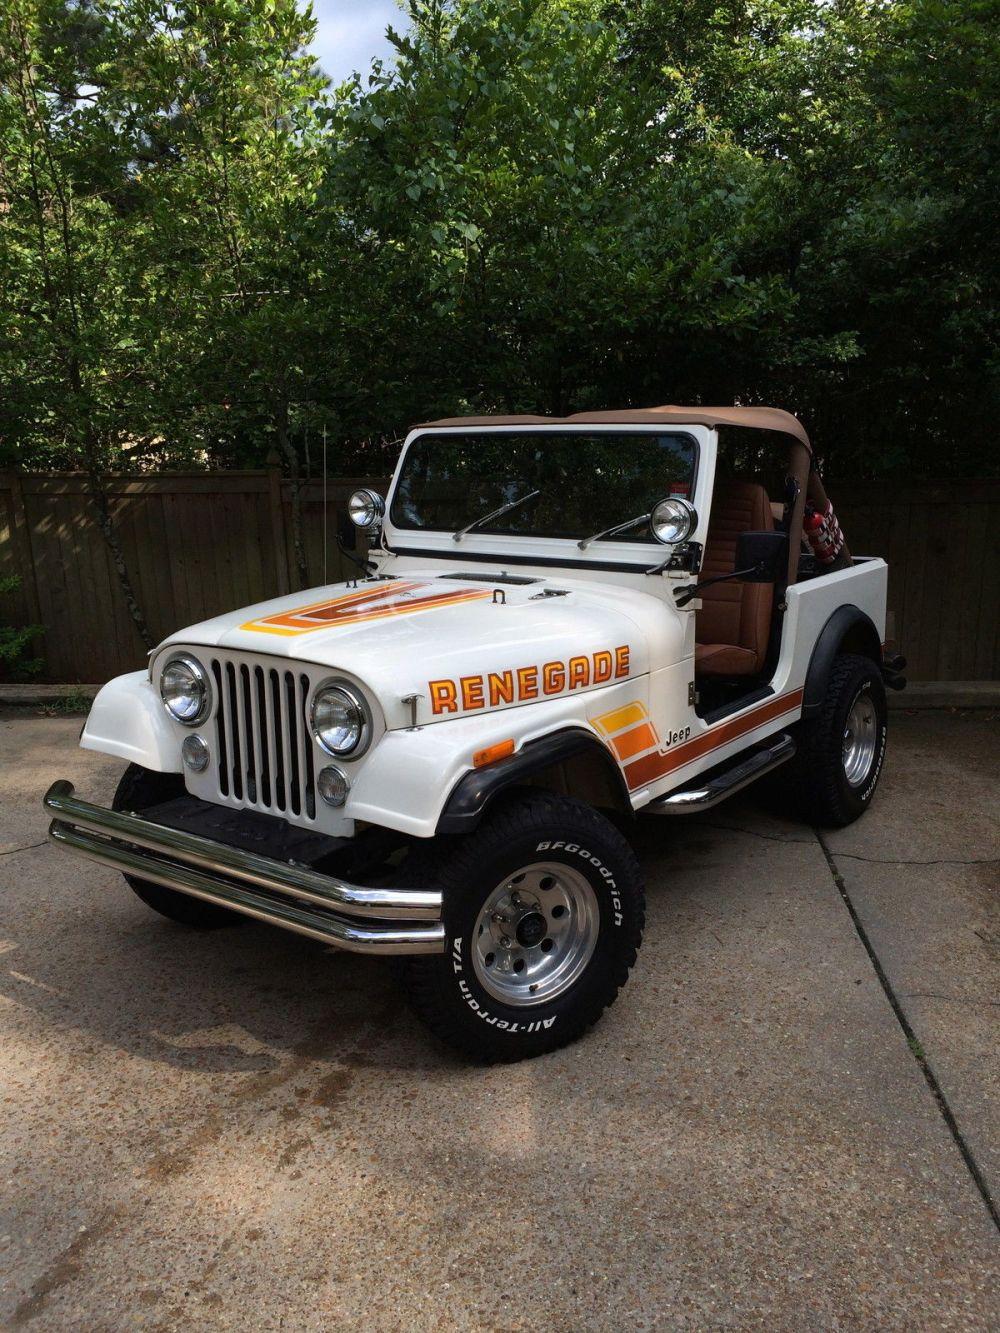 medium resolution of 1984 jeep cj7 a c and hardtop make offer renegade cj 7